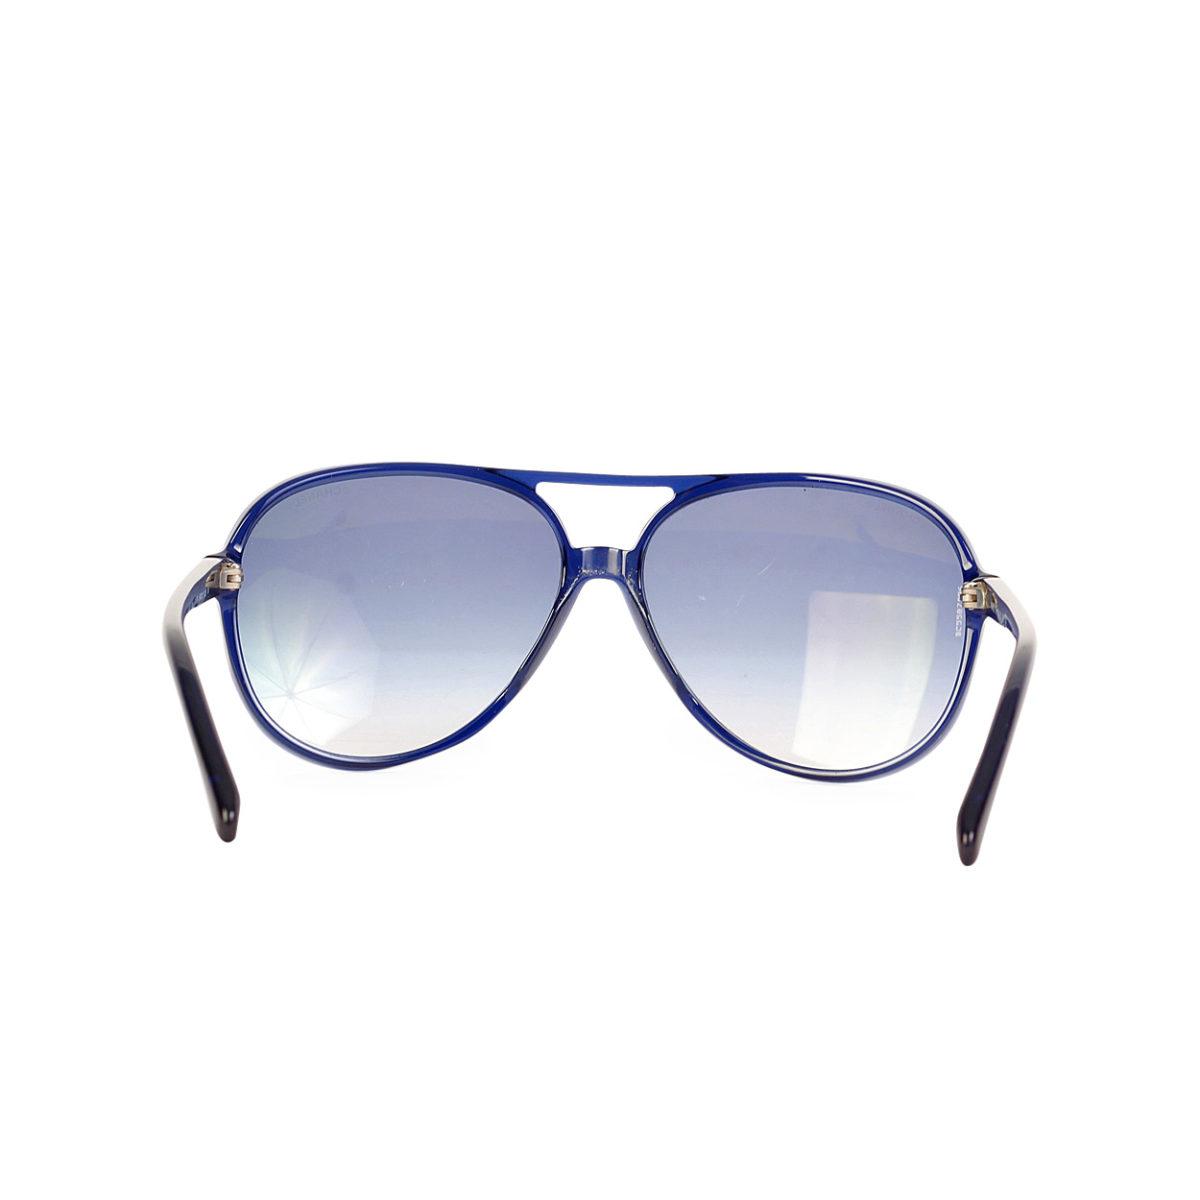 c2c89d8272 Chanel 4189tq Cc Logo Aviator Sunglasses C